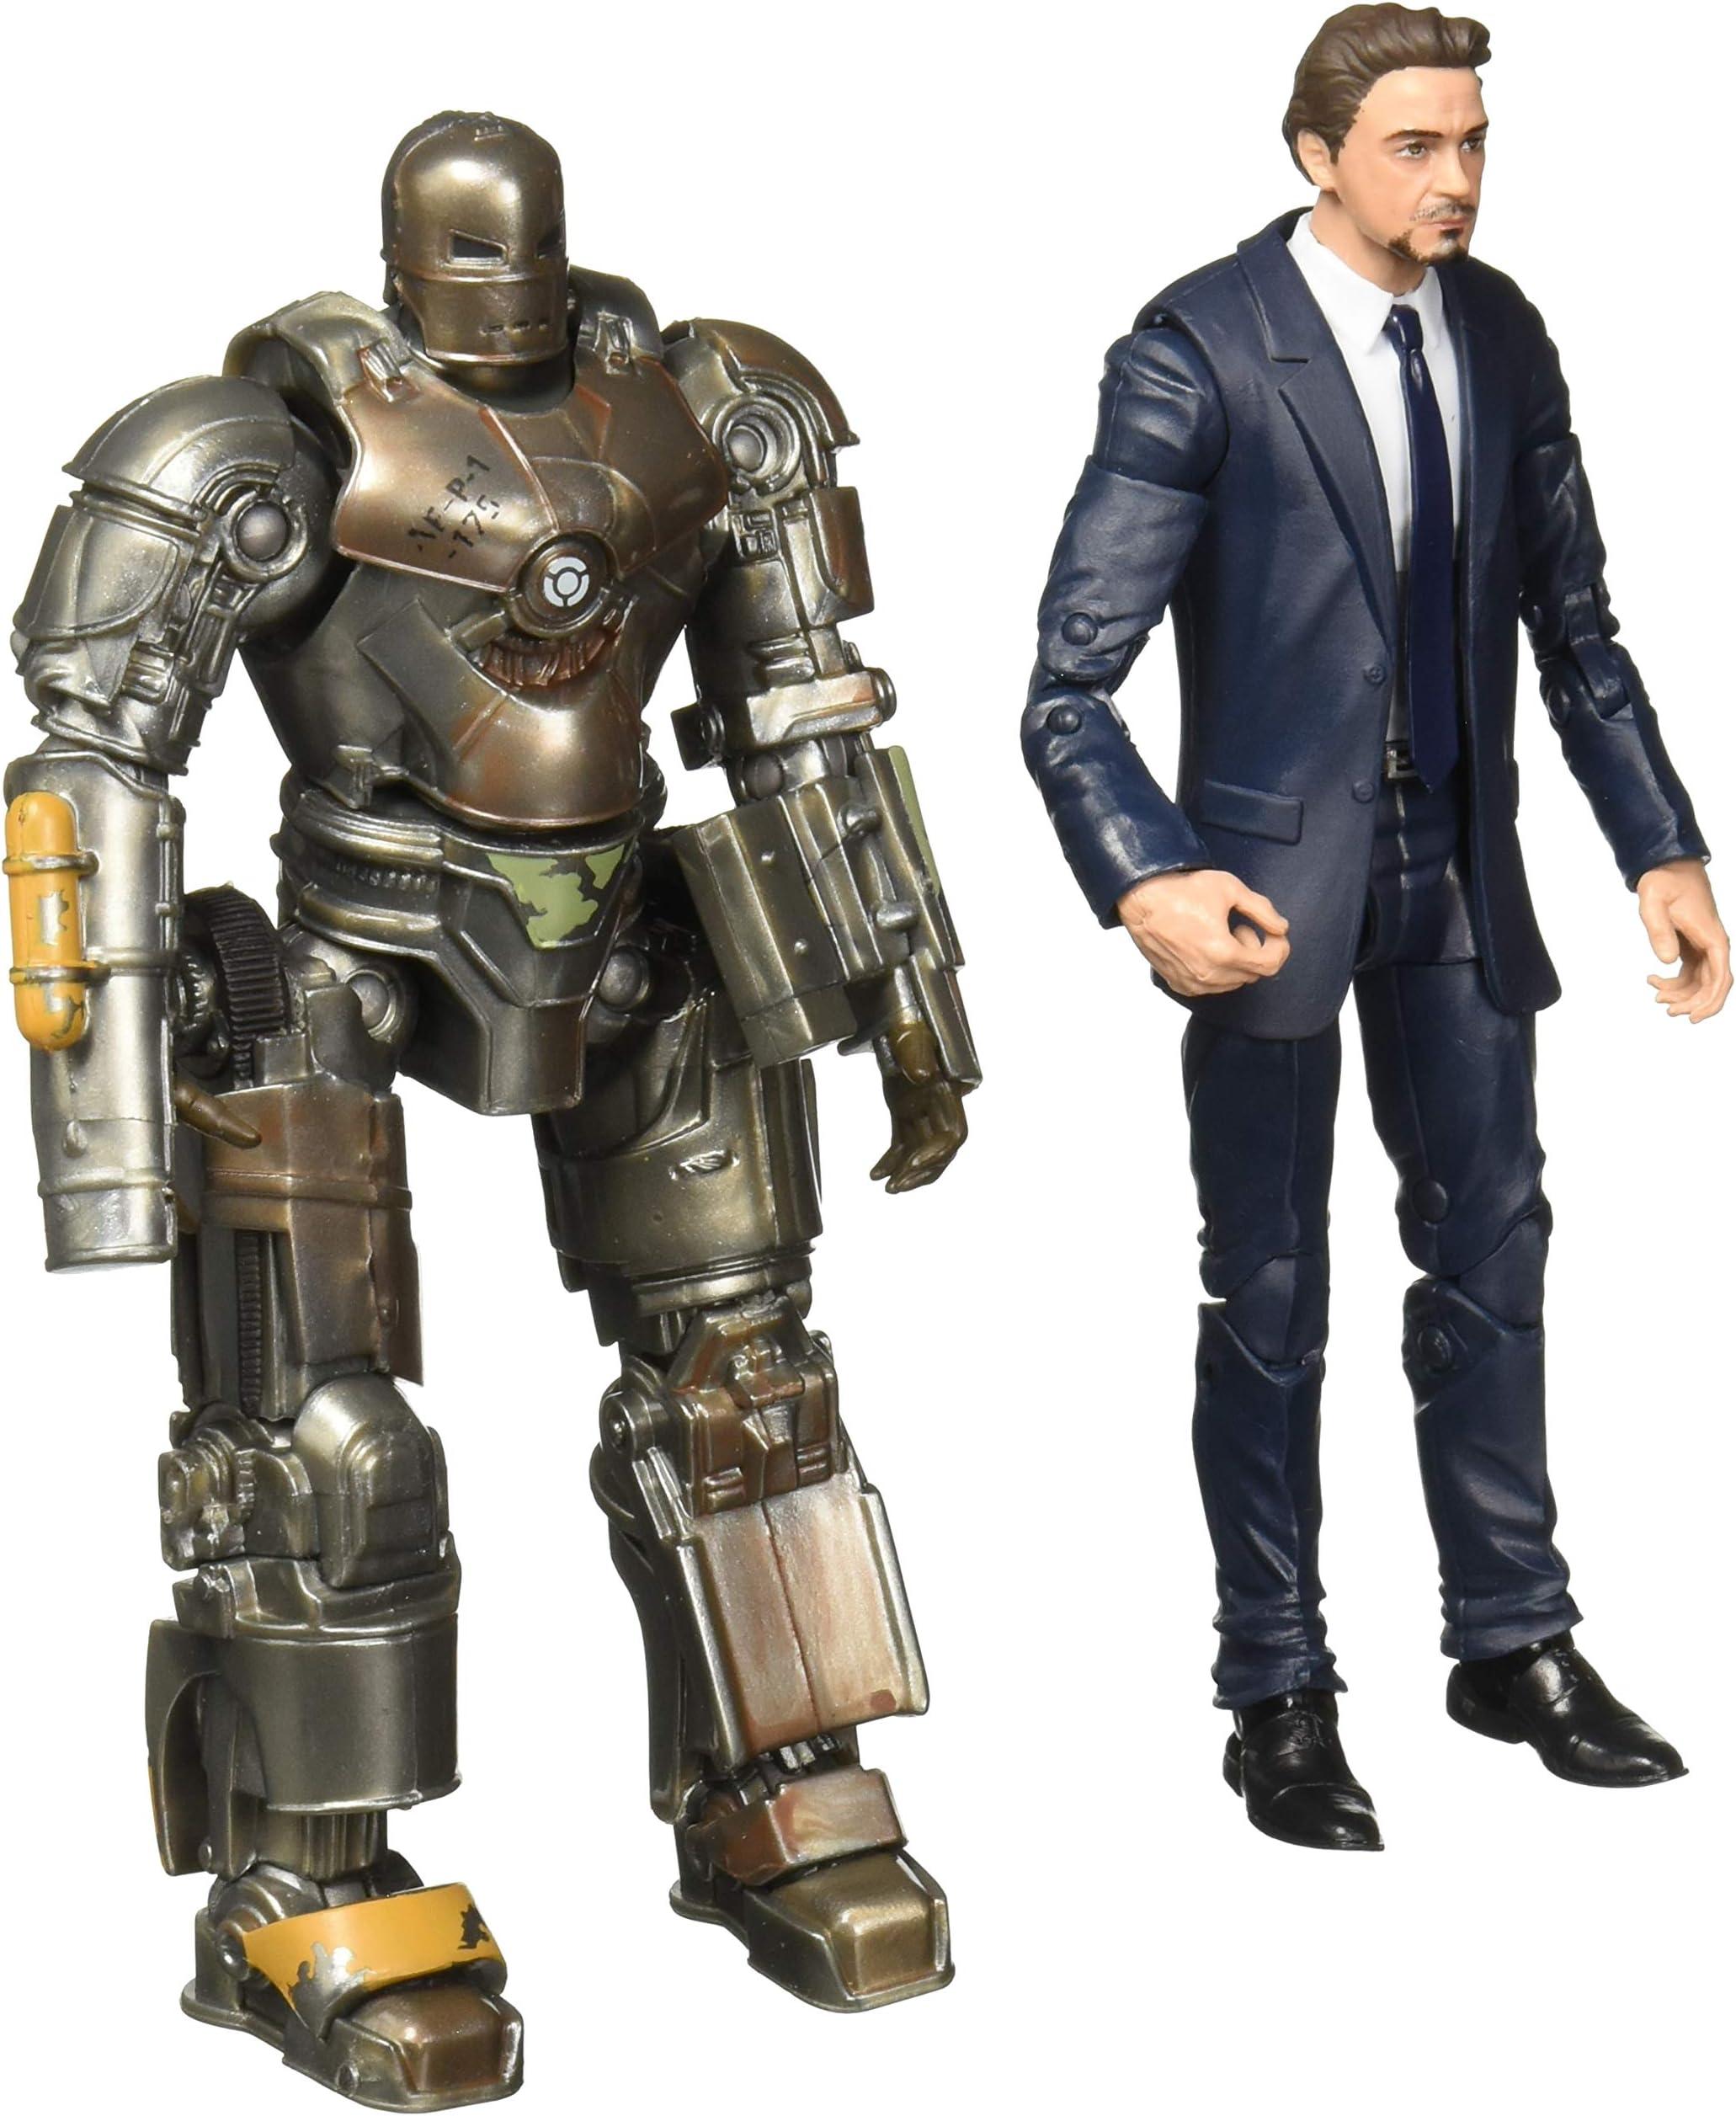 Iron Man Mark 1 /& Tony Stark Marvel Legends 10th Anniversary *LOOSE*